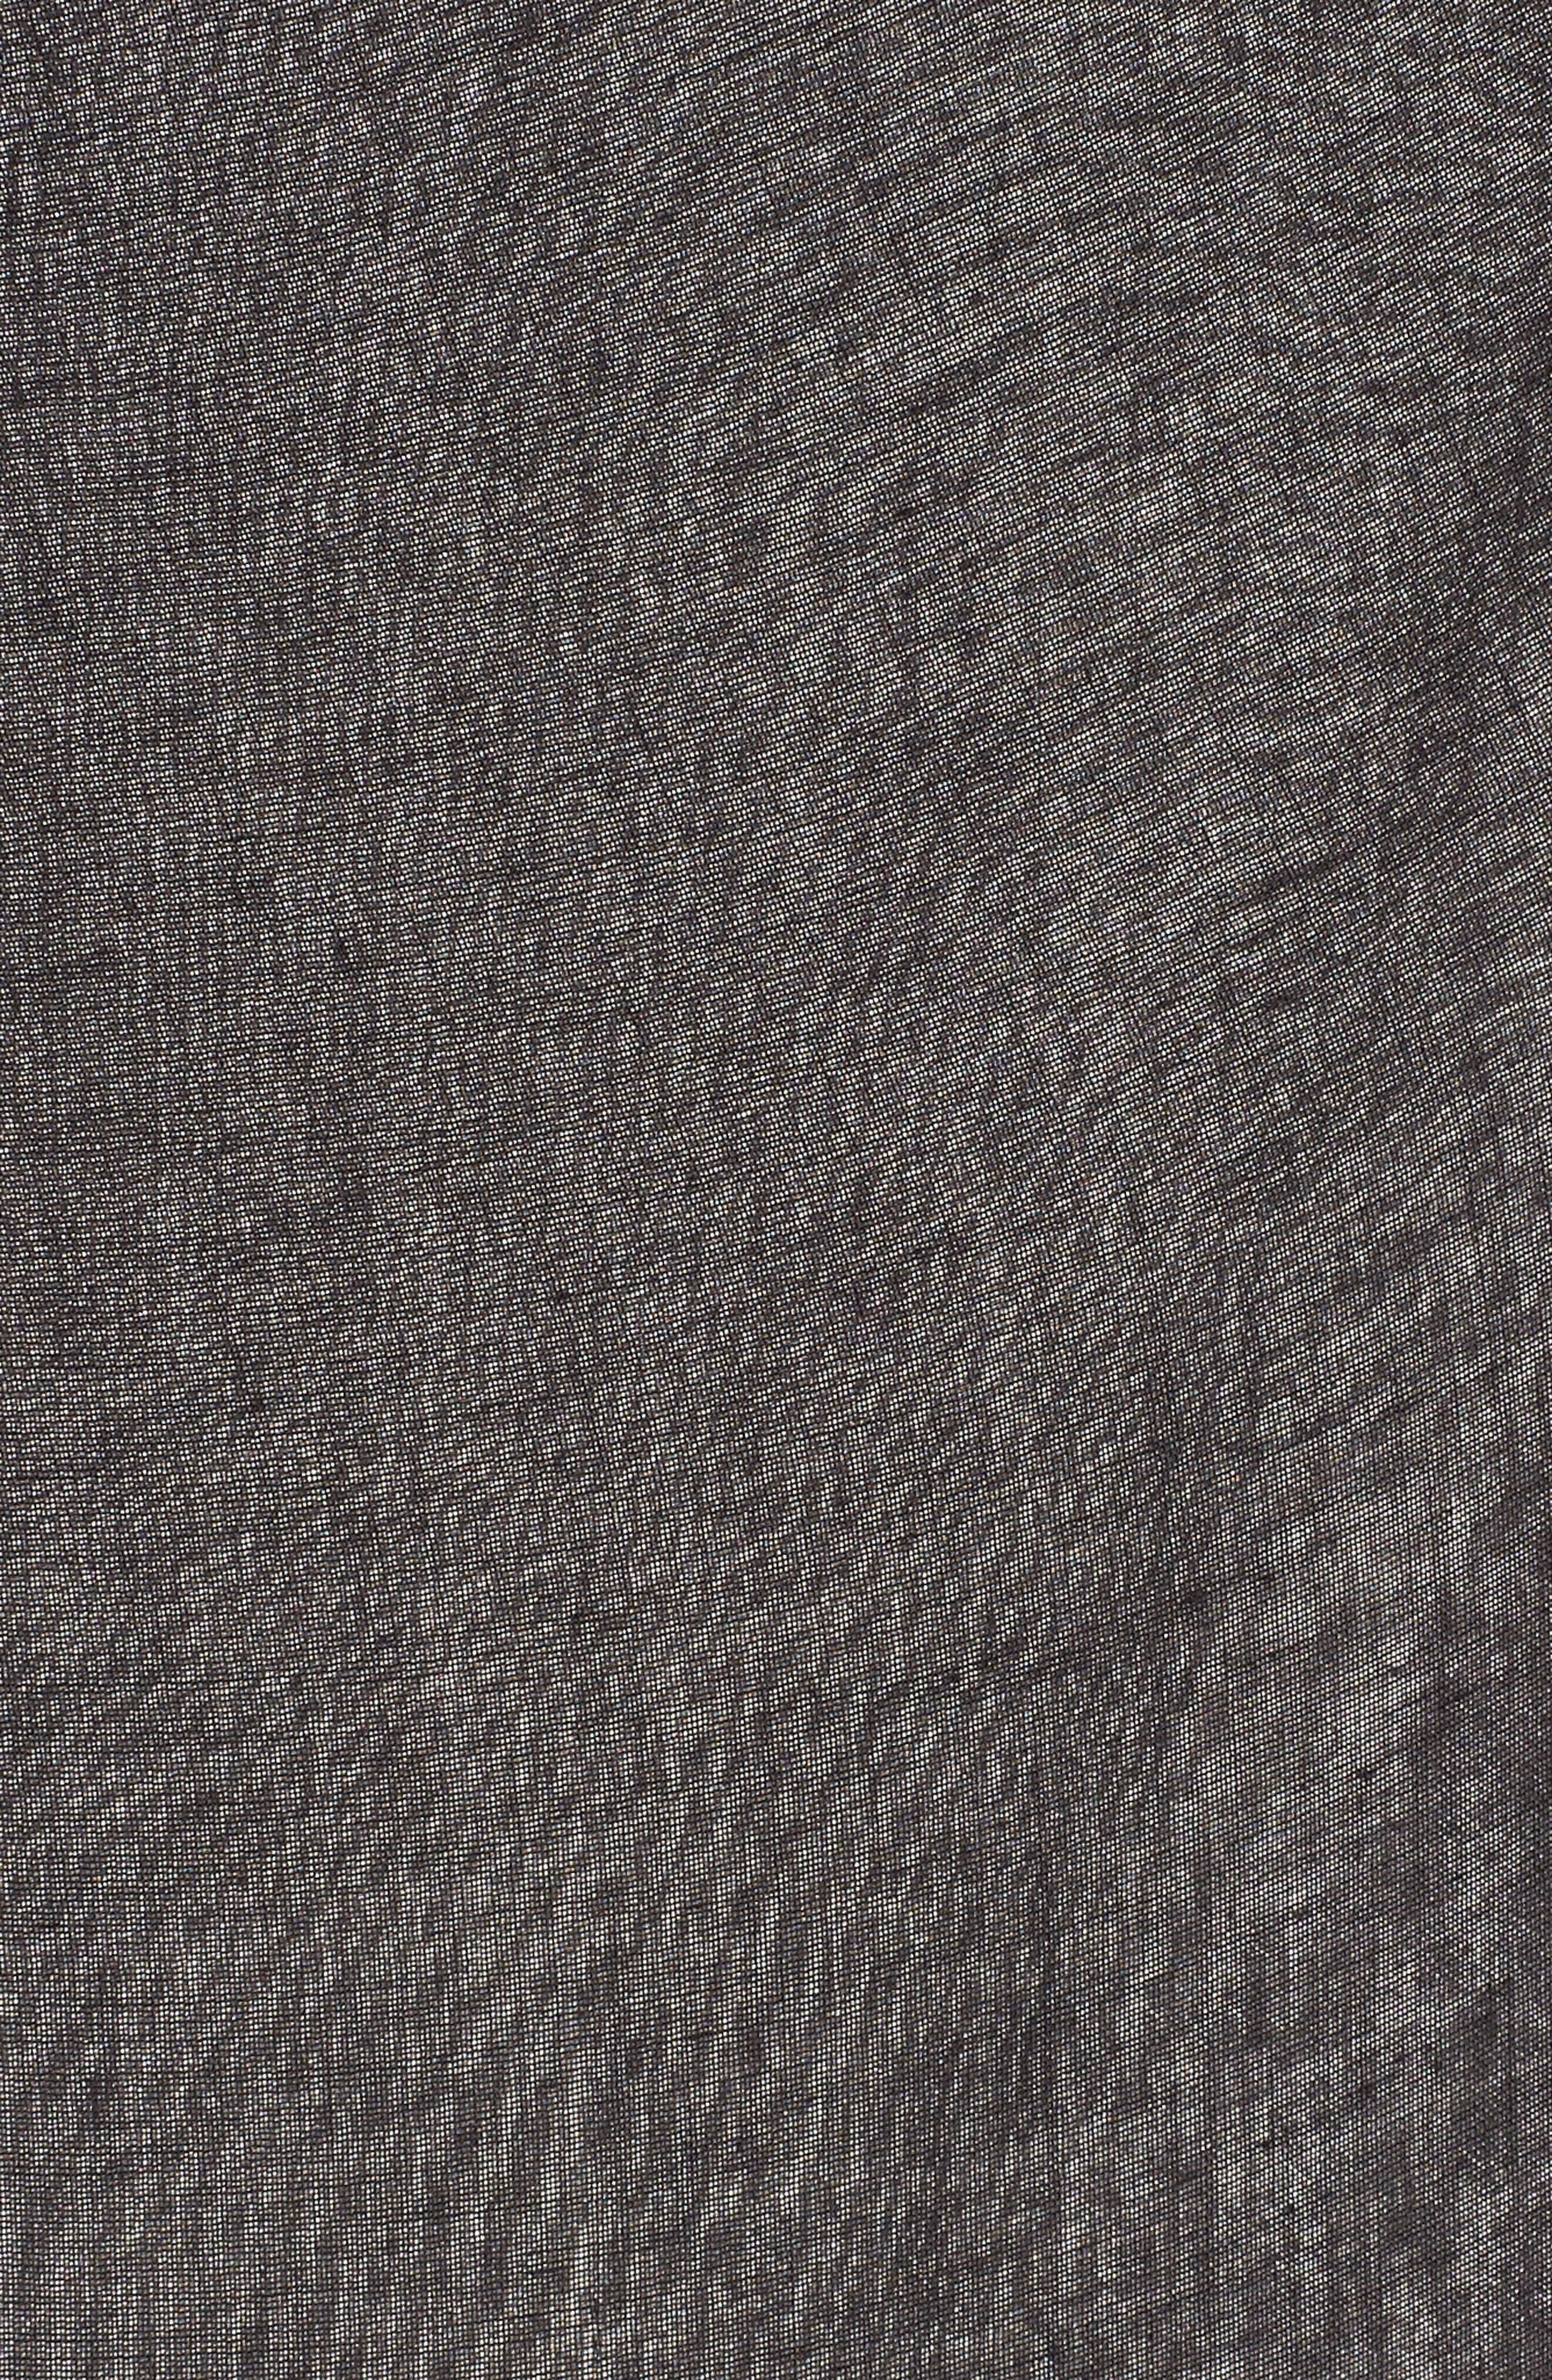 Seychelles Maxi Cover-Up,                             Alternate thumbnail 5, color,                             001